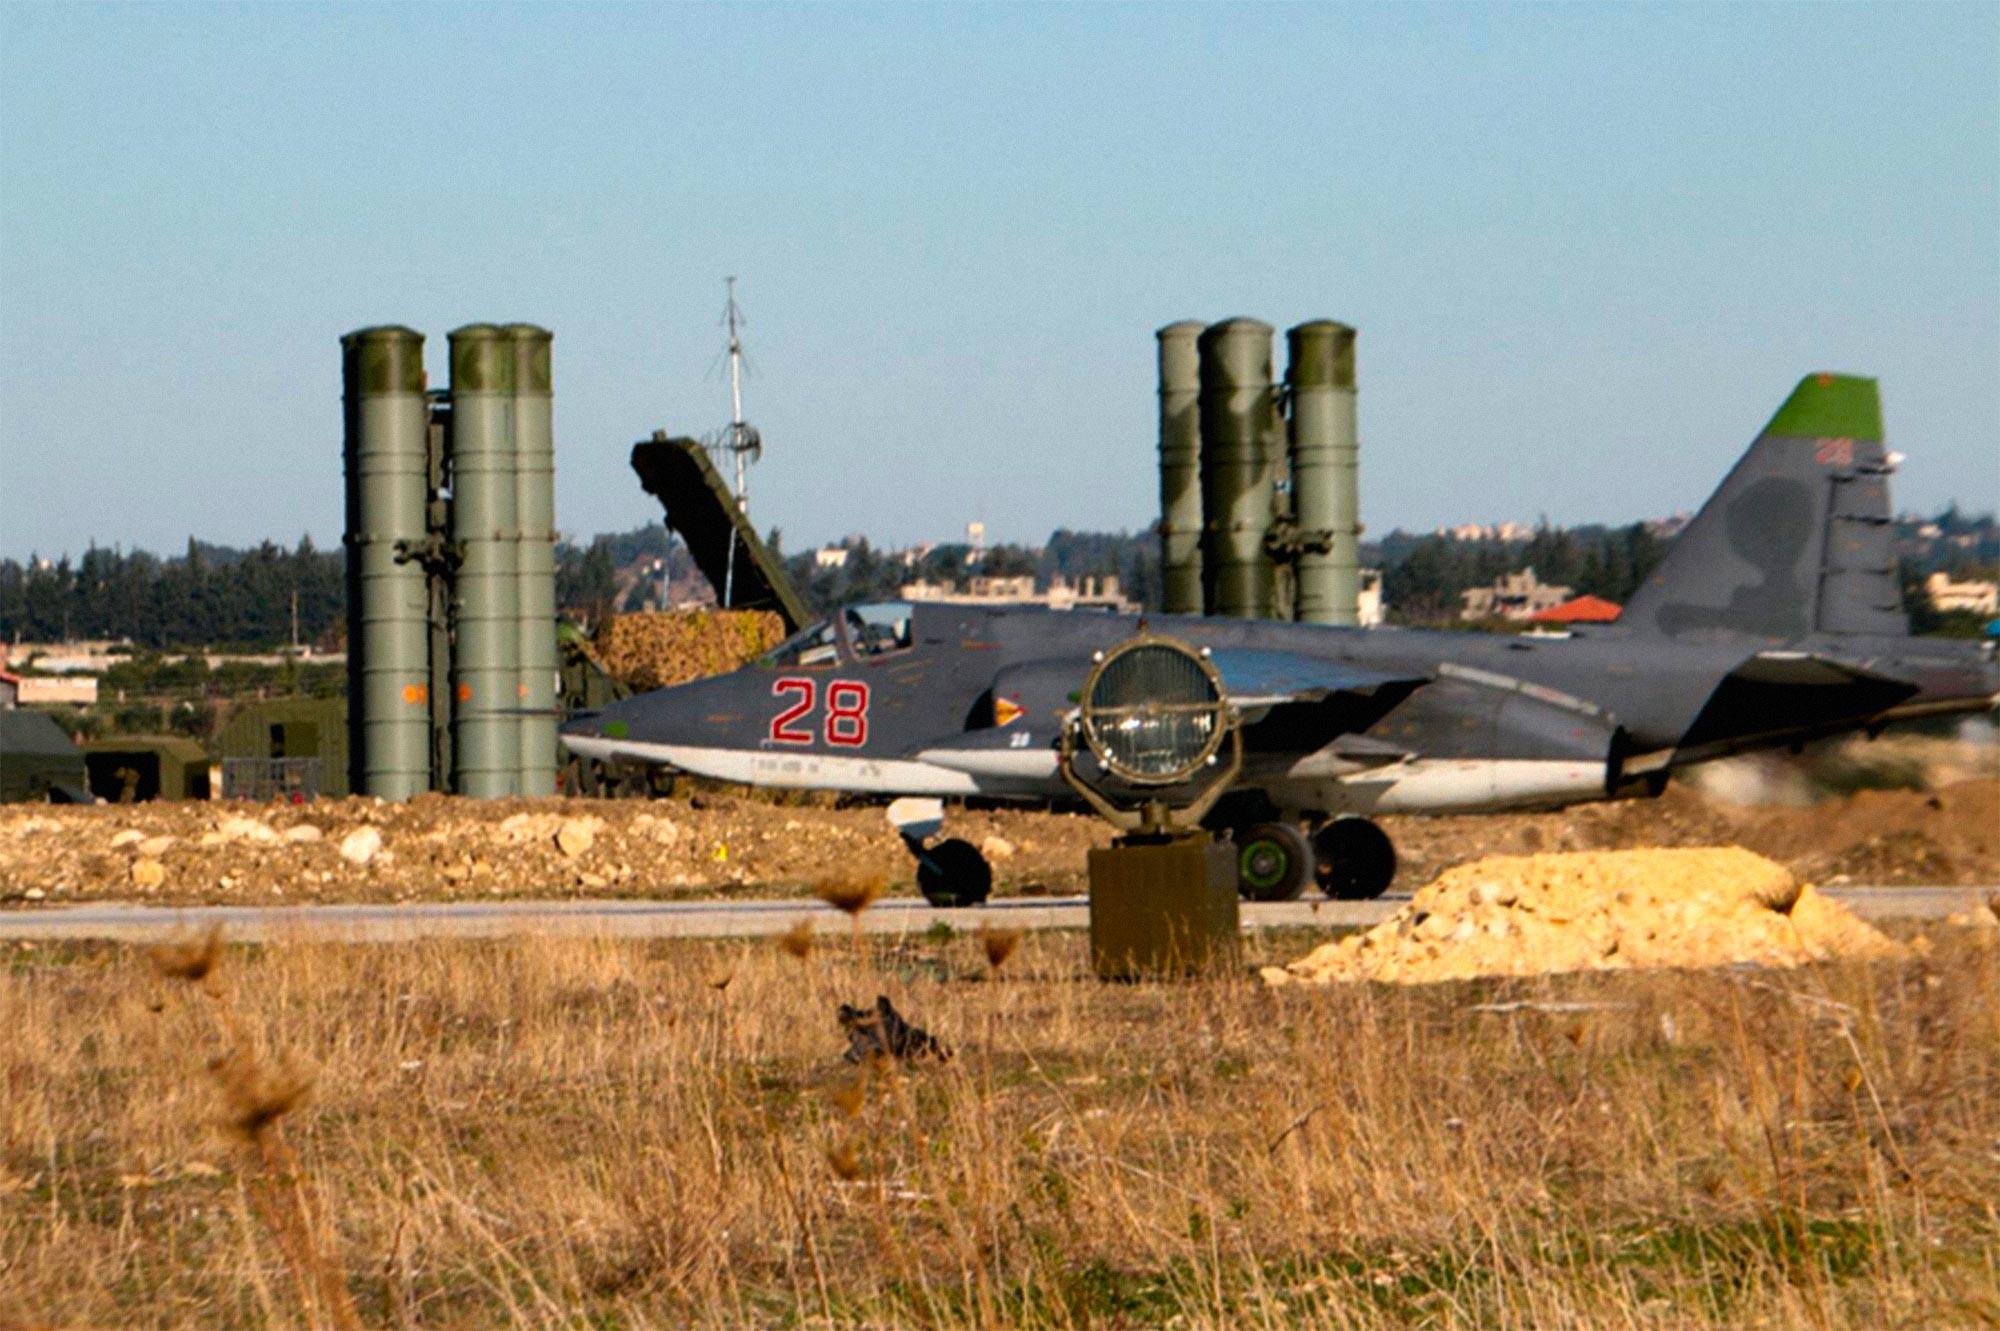 "<div> <p>Фото: &copy;&nbsp;<a href=""http://syria.mil.ru/photo/gallery.htm?id=26643@cmsPhotoGallery"" target=""_blank"">Министерство обороны Российской Федерации</a></p> </div>"